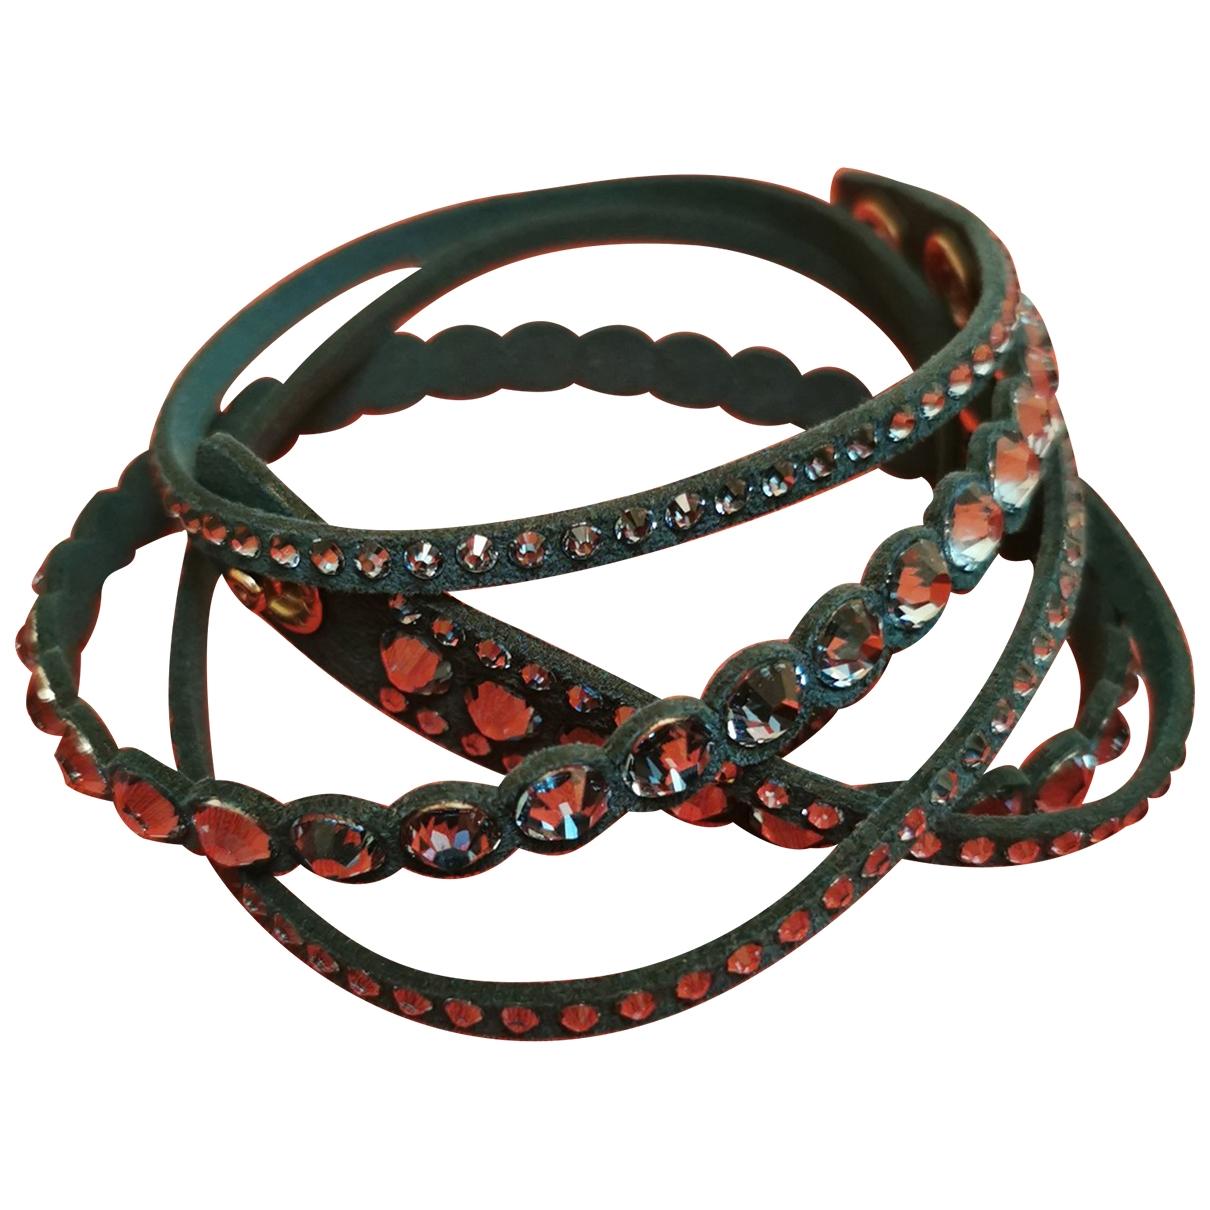 Swarovski - Bracelet Slake pour femme en toile - turquoise